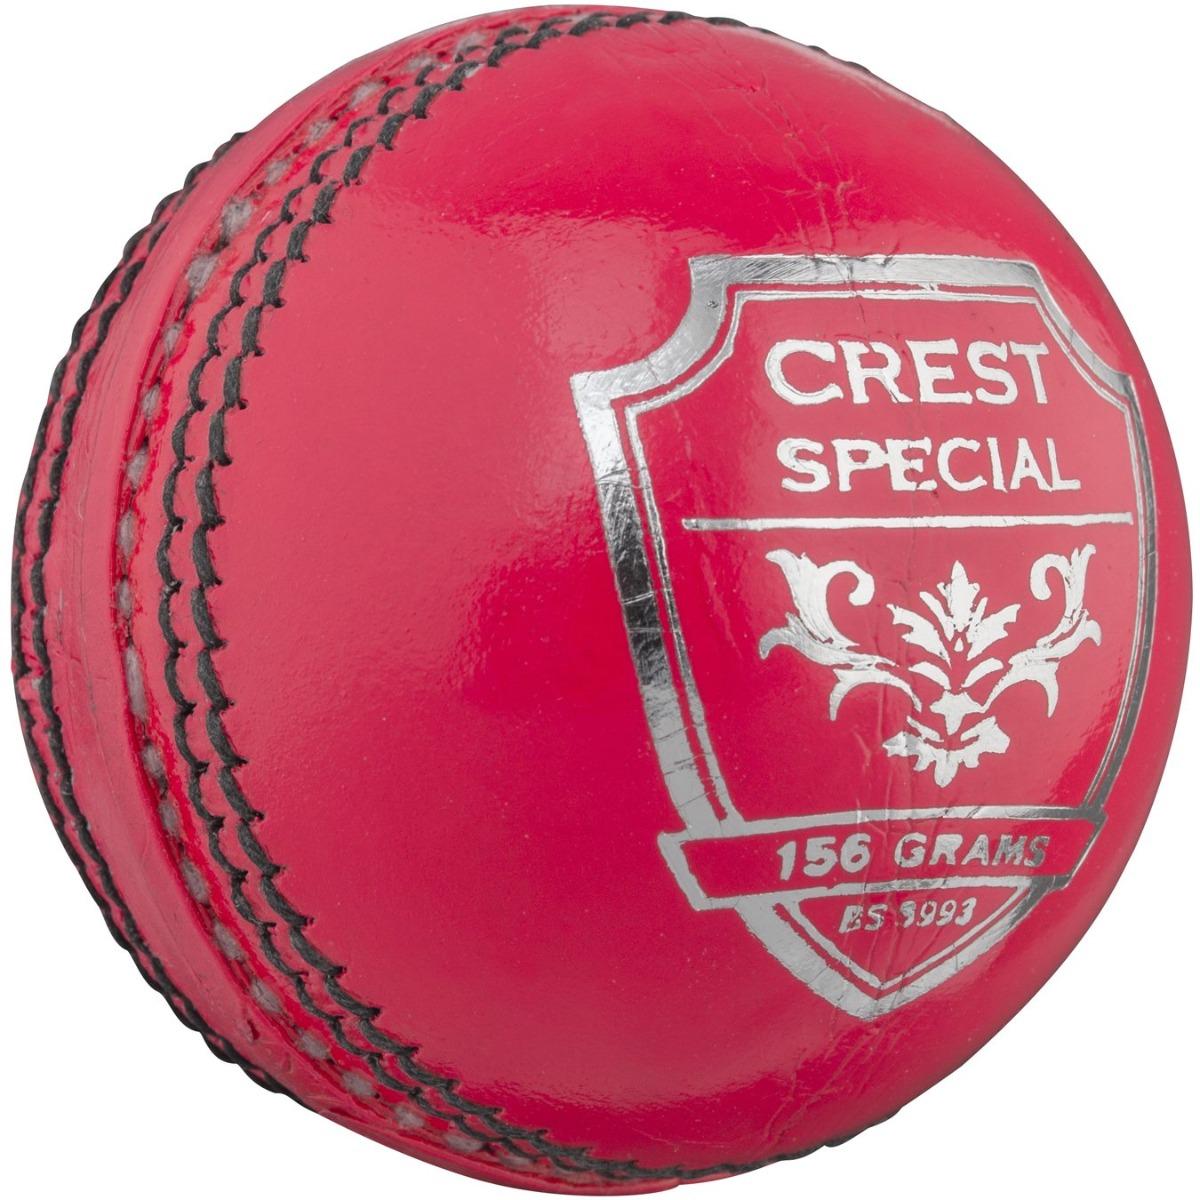 https://www.best4sportsballs.com/pub/media/catalog/product/p/i/pink_crest_special_back.jpg